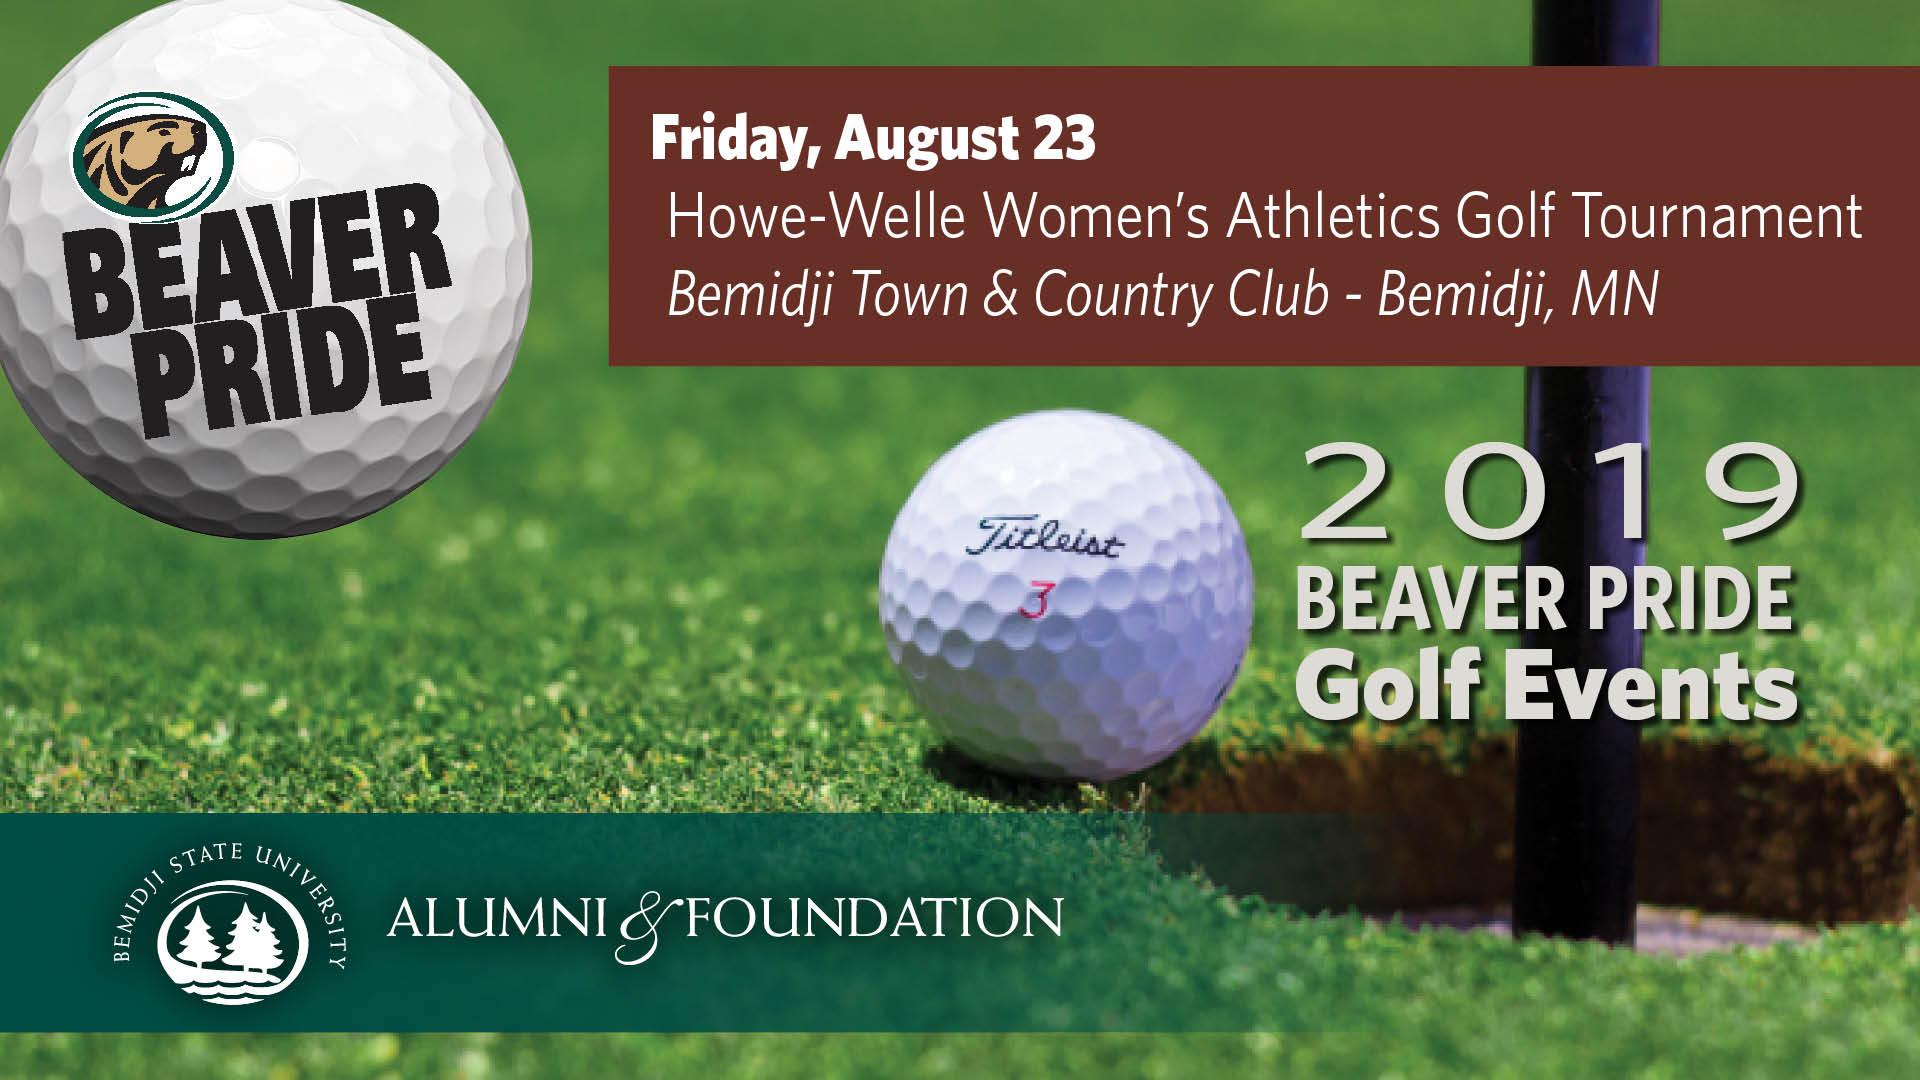 Golf Beaver Pride: Howe-Welle Women's Athletics Golf Tournament